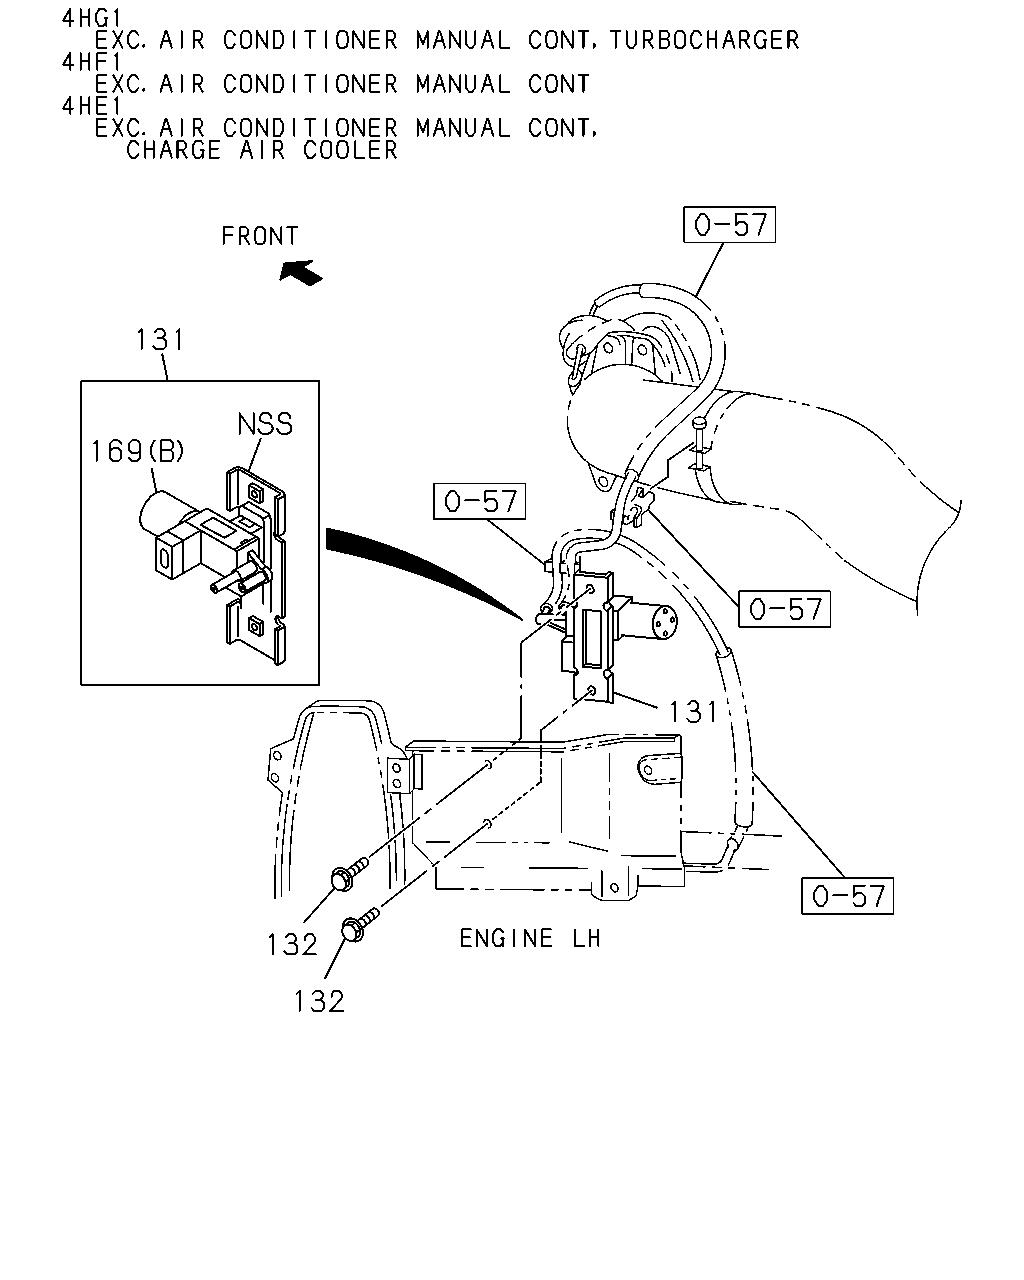 hight resolution of isuzu 4he1 engine diagram wiring library 2006 isuzu ascender engine diagram isuzu 4he1 engine diagram